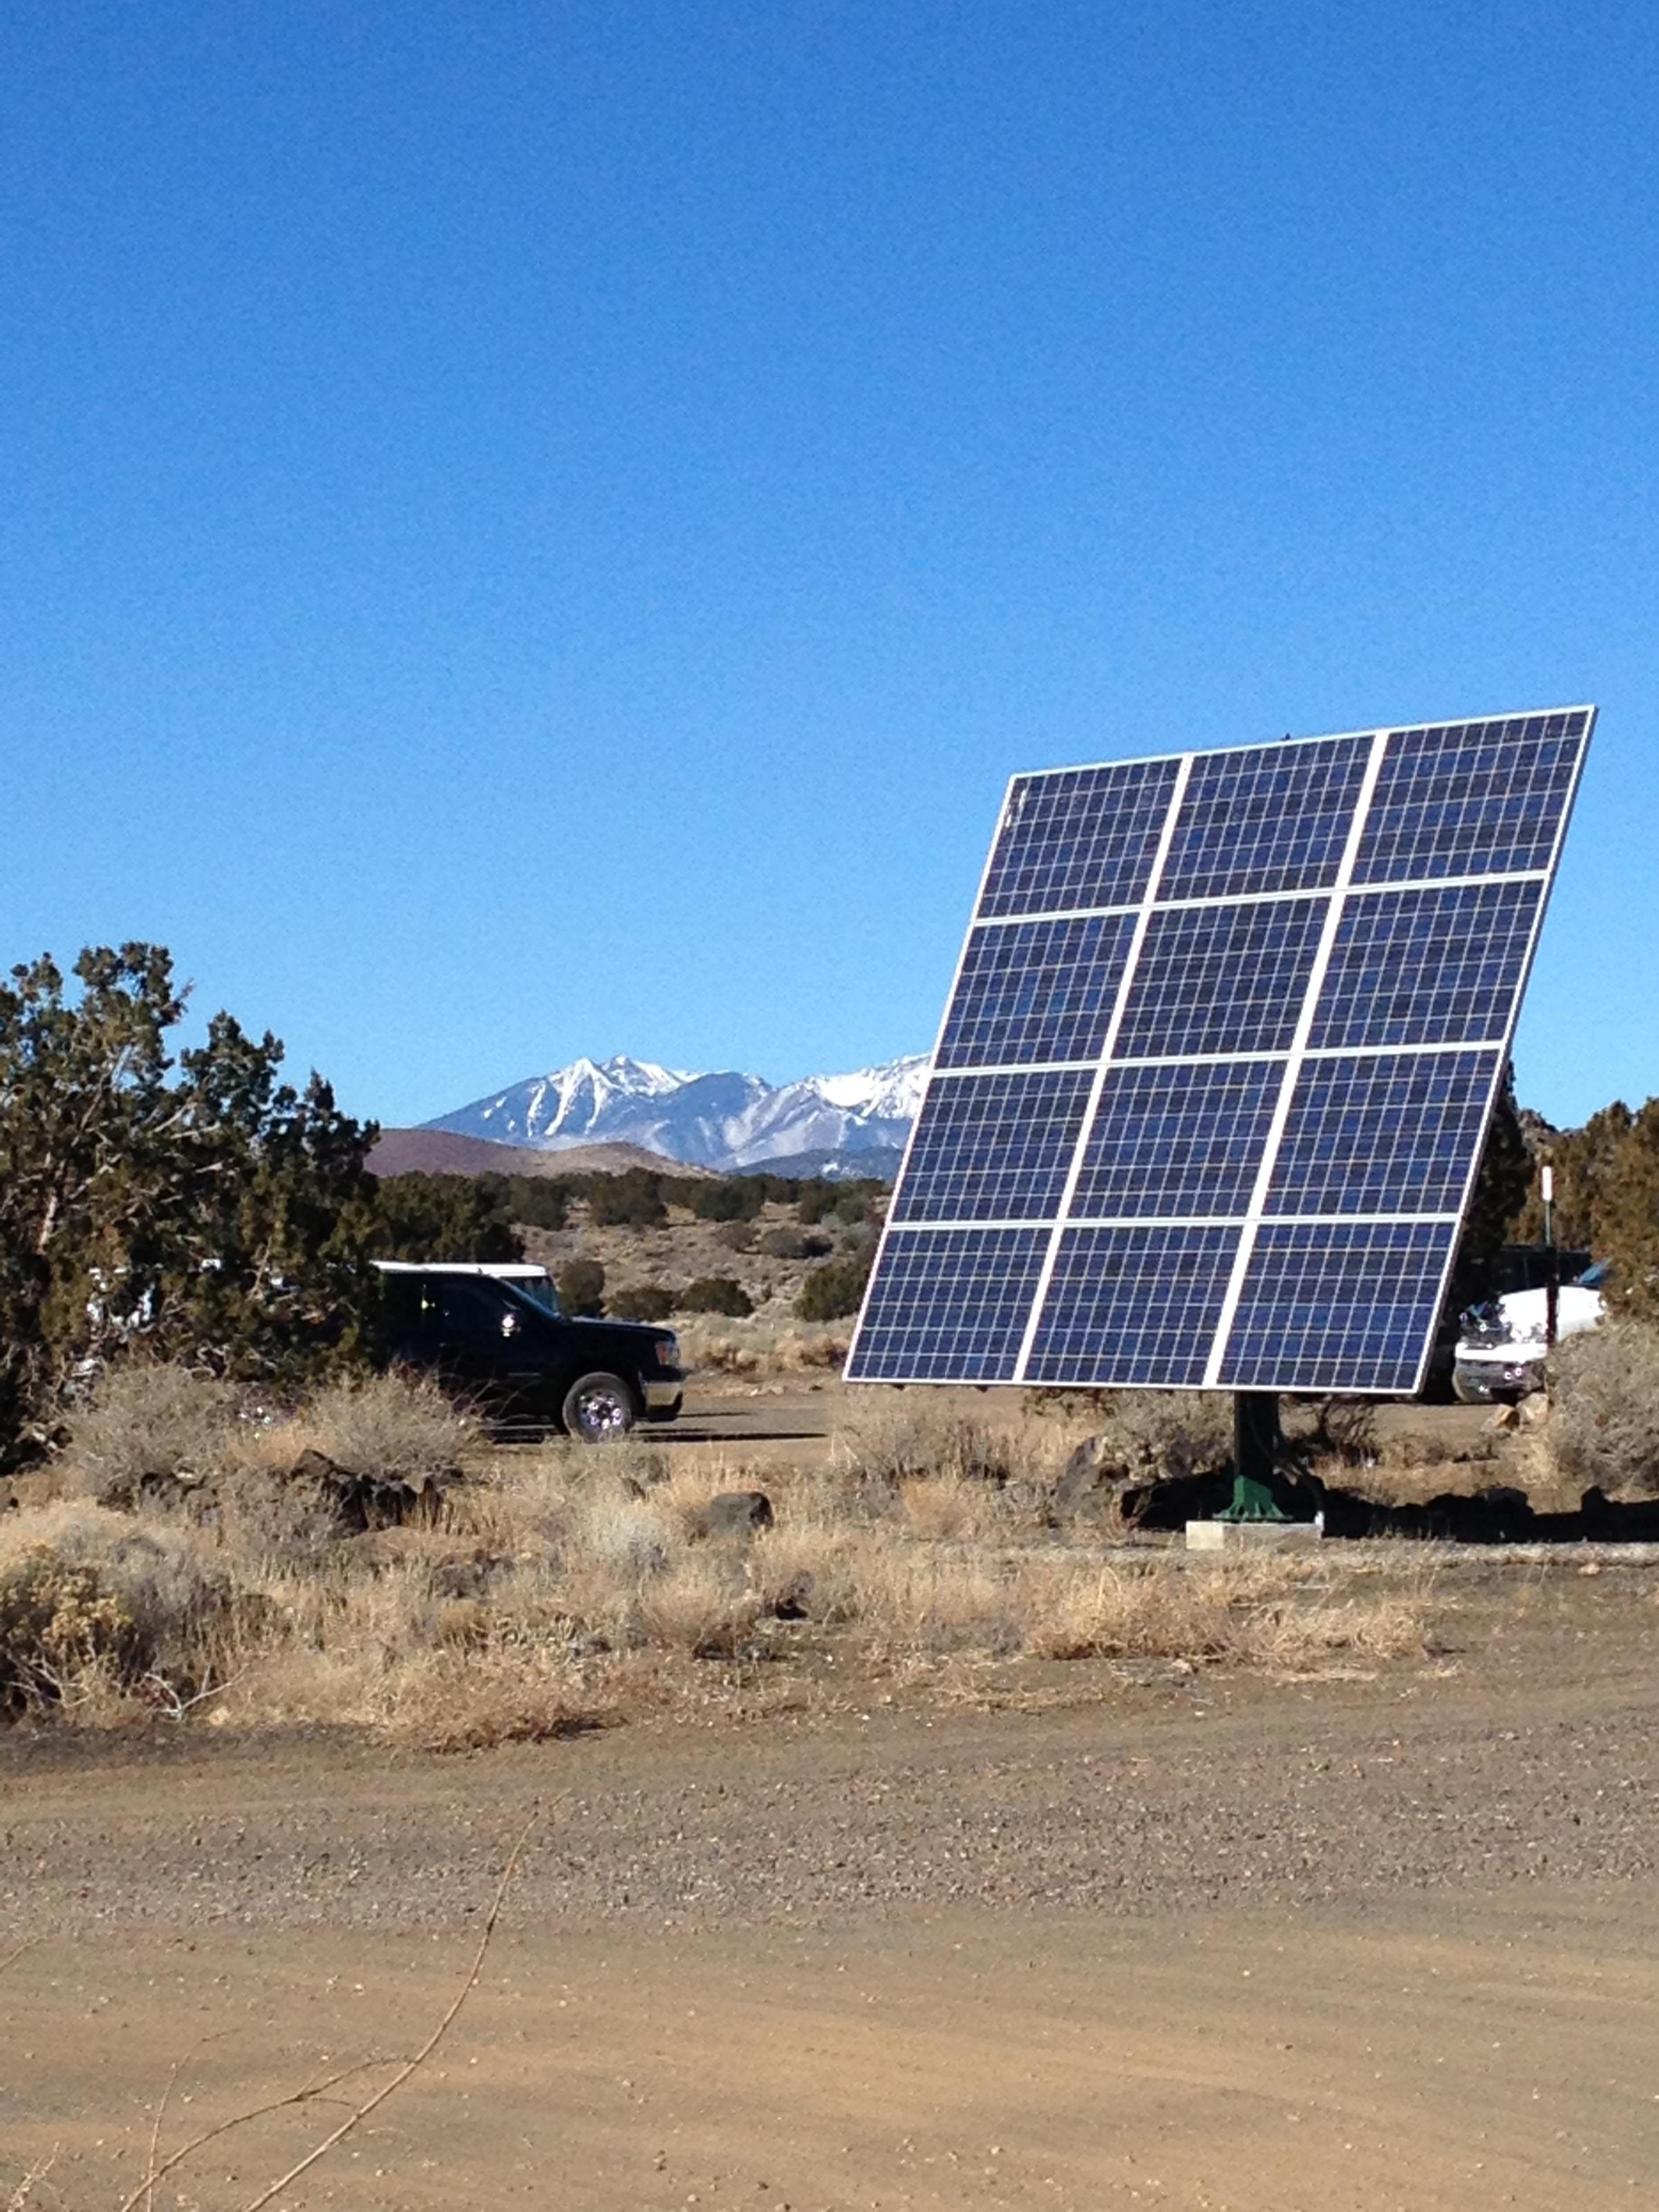 No Az Solar School One Of The Coolest Schools In America